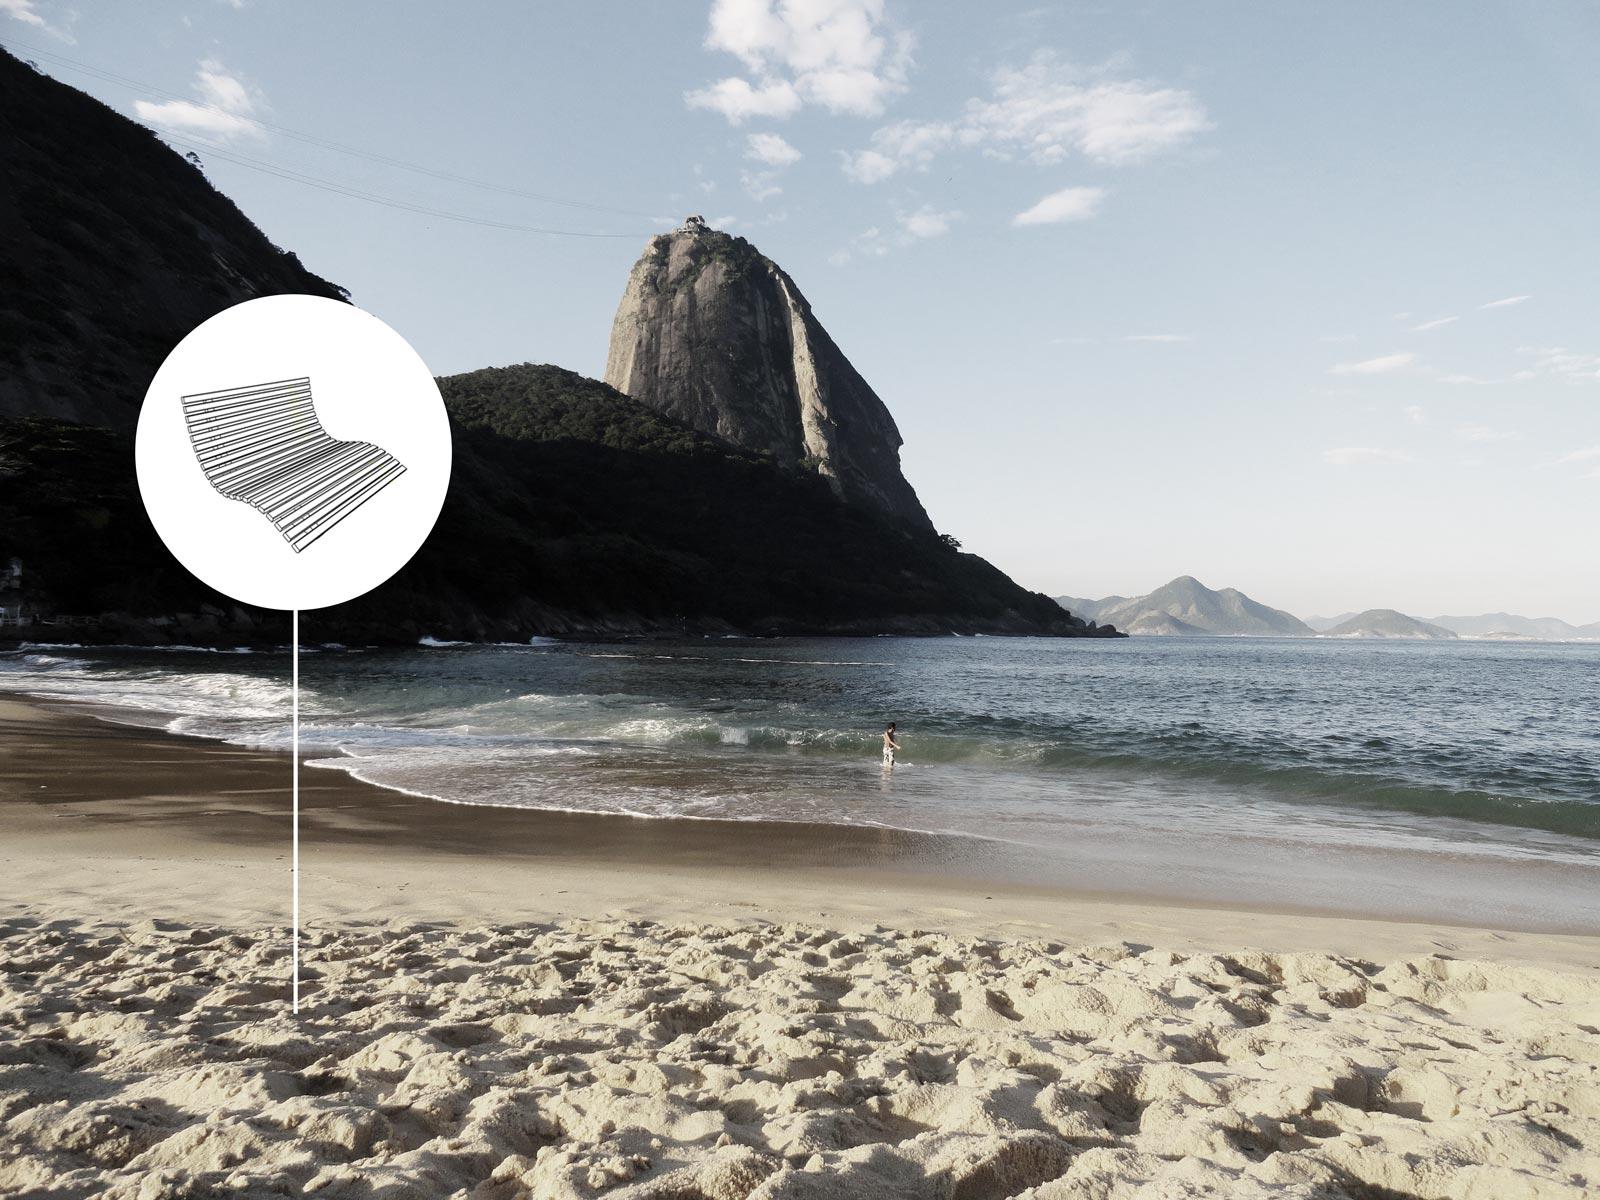 hangsofa-strandliege-sandliege-wellenliege